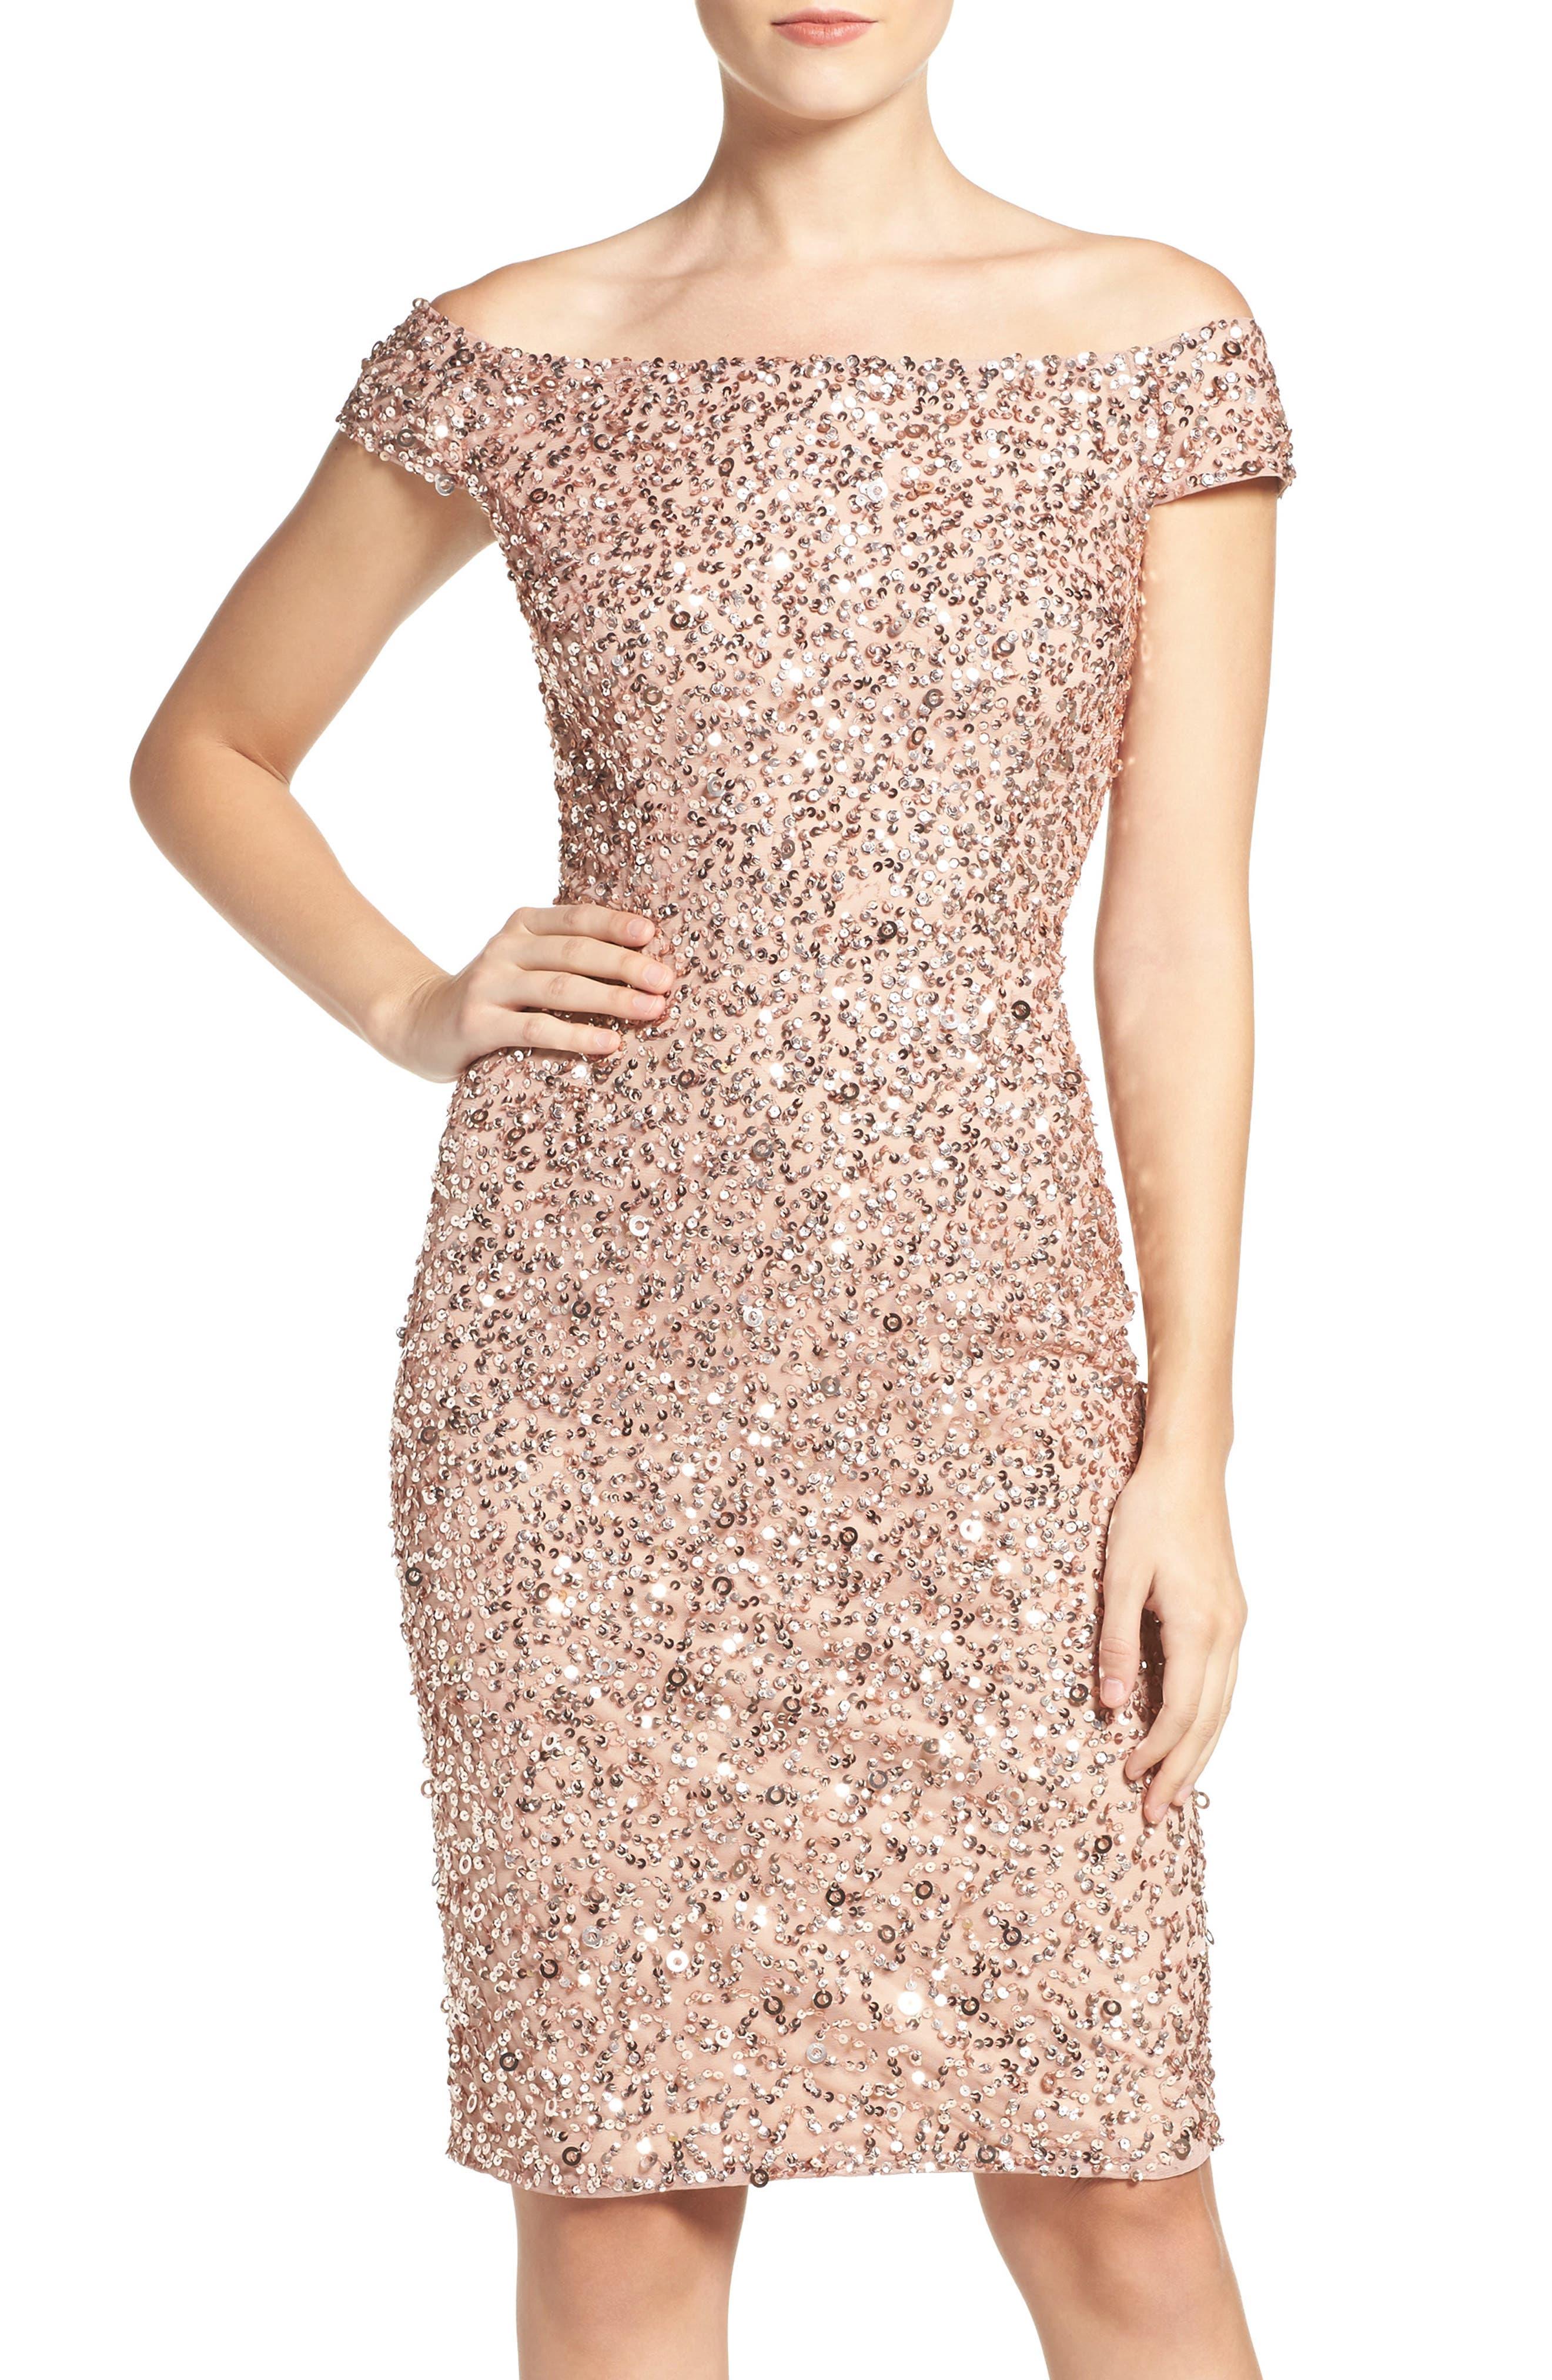 Main Image - Adrianna Papell Off the Shoulder Sequin Sheath Dress (Regular & Petite)